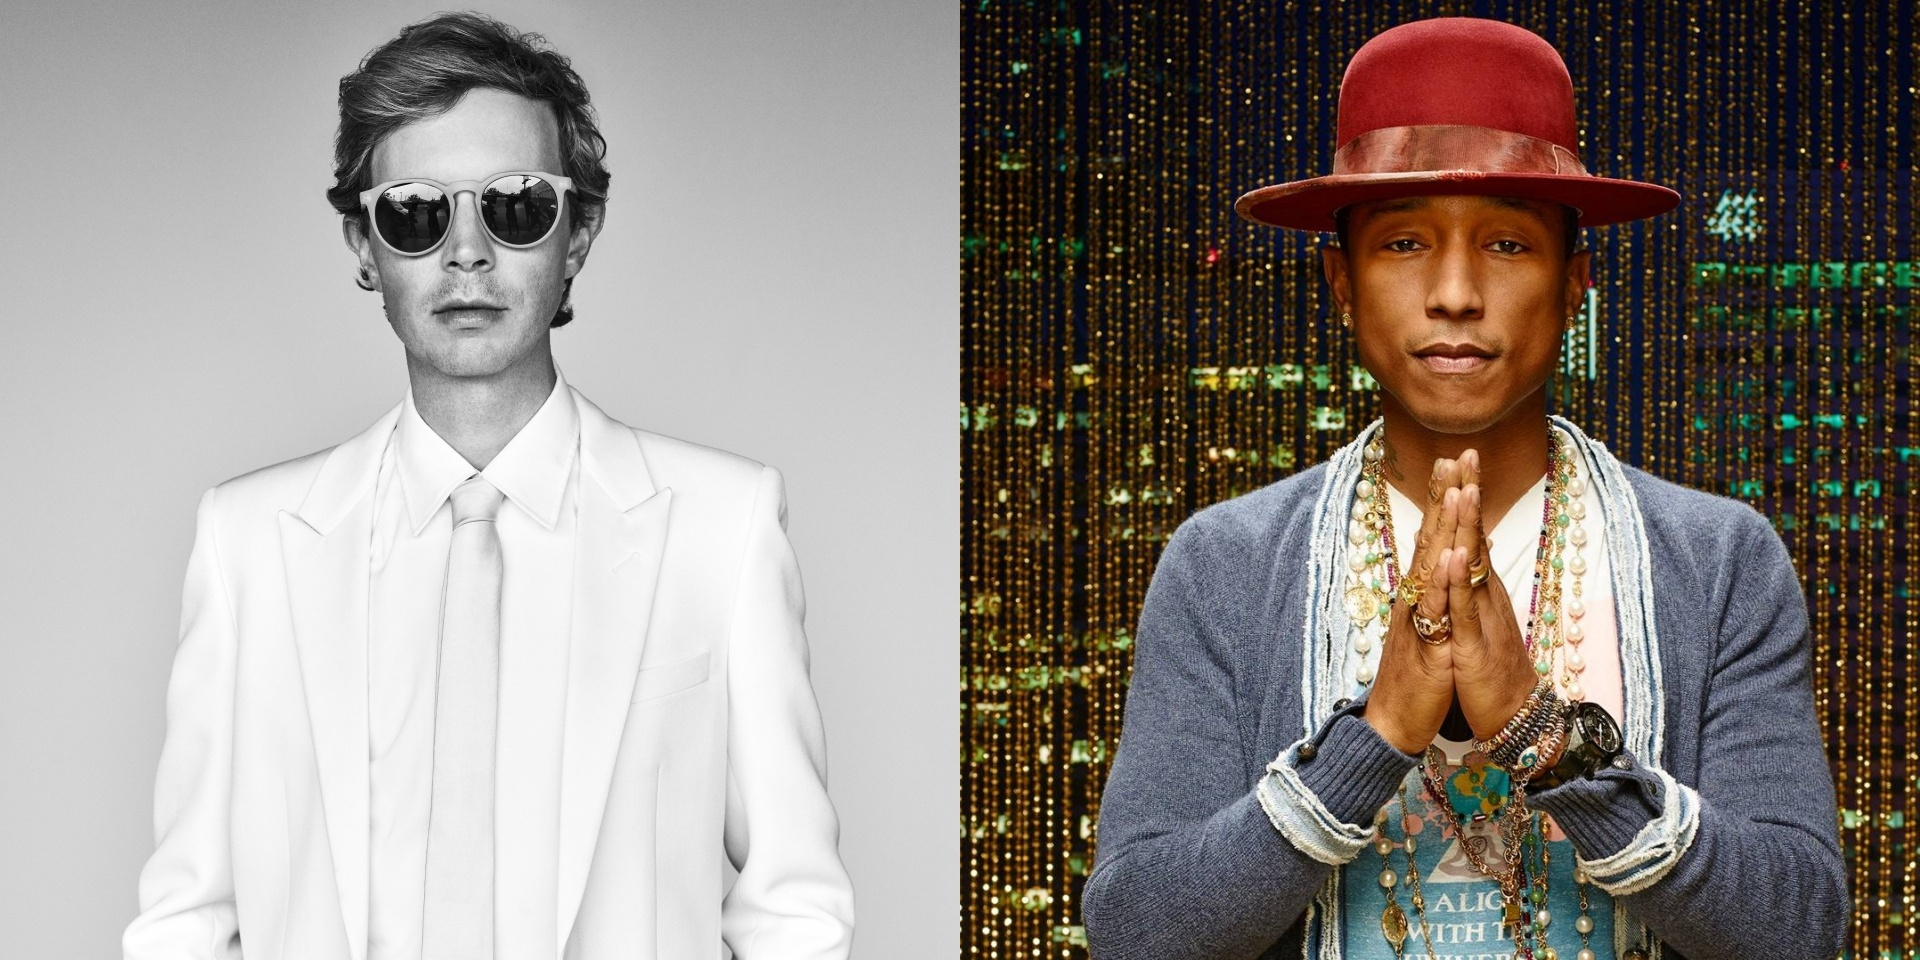 Beck announces new album, shares new single with Pharrell – listen